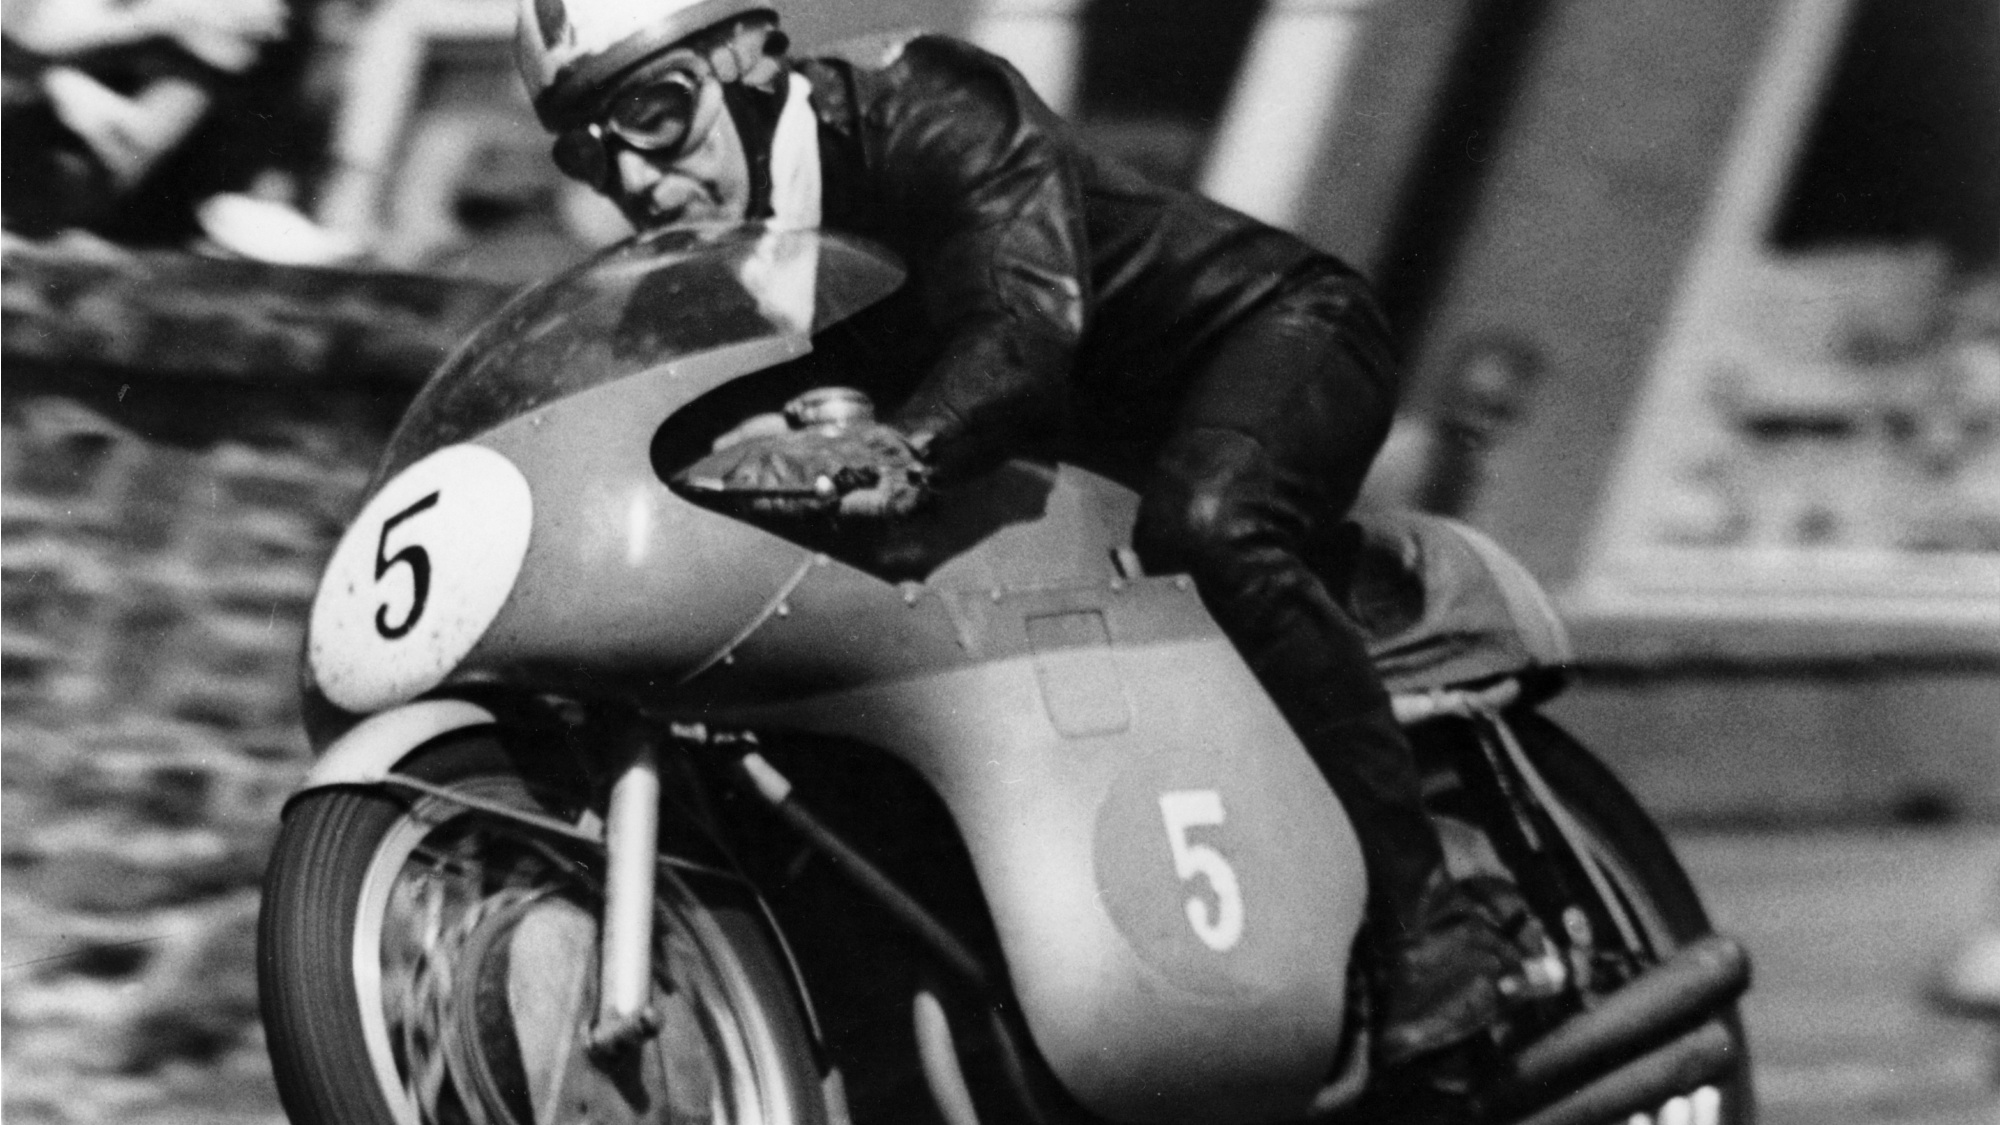 John Surtees, 1959 Isle of Man TT